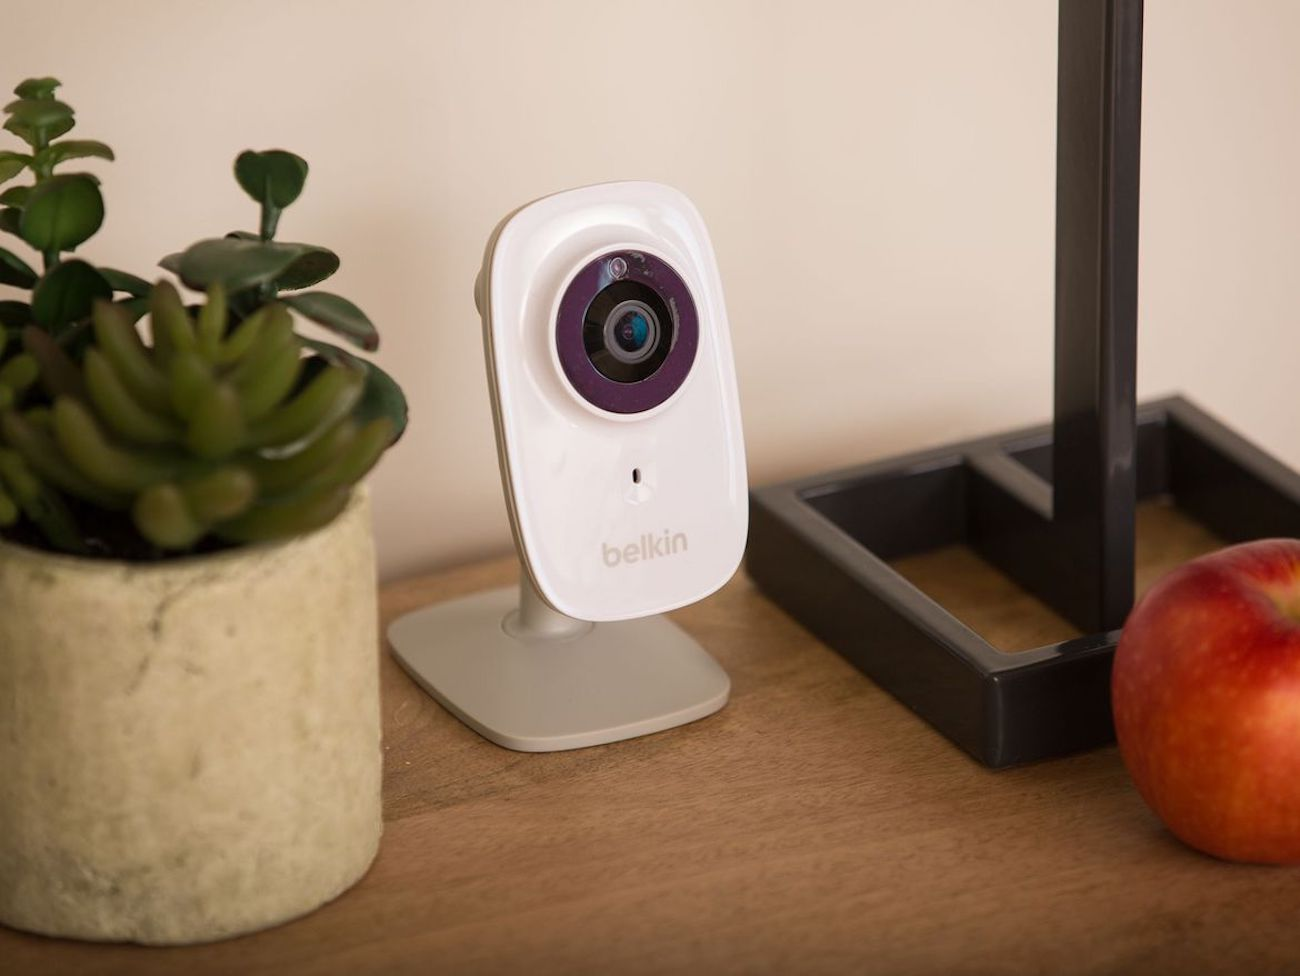 Belkin NetCam HD+ Night Vision Security Camera